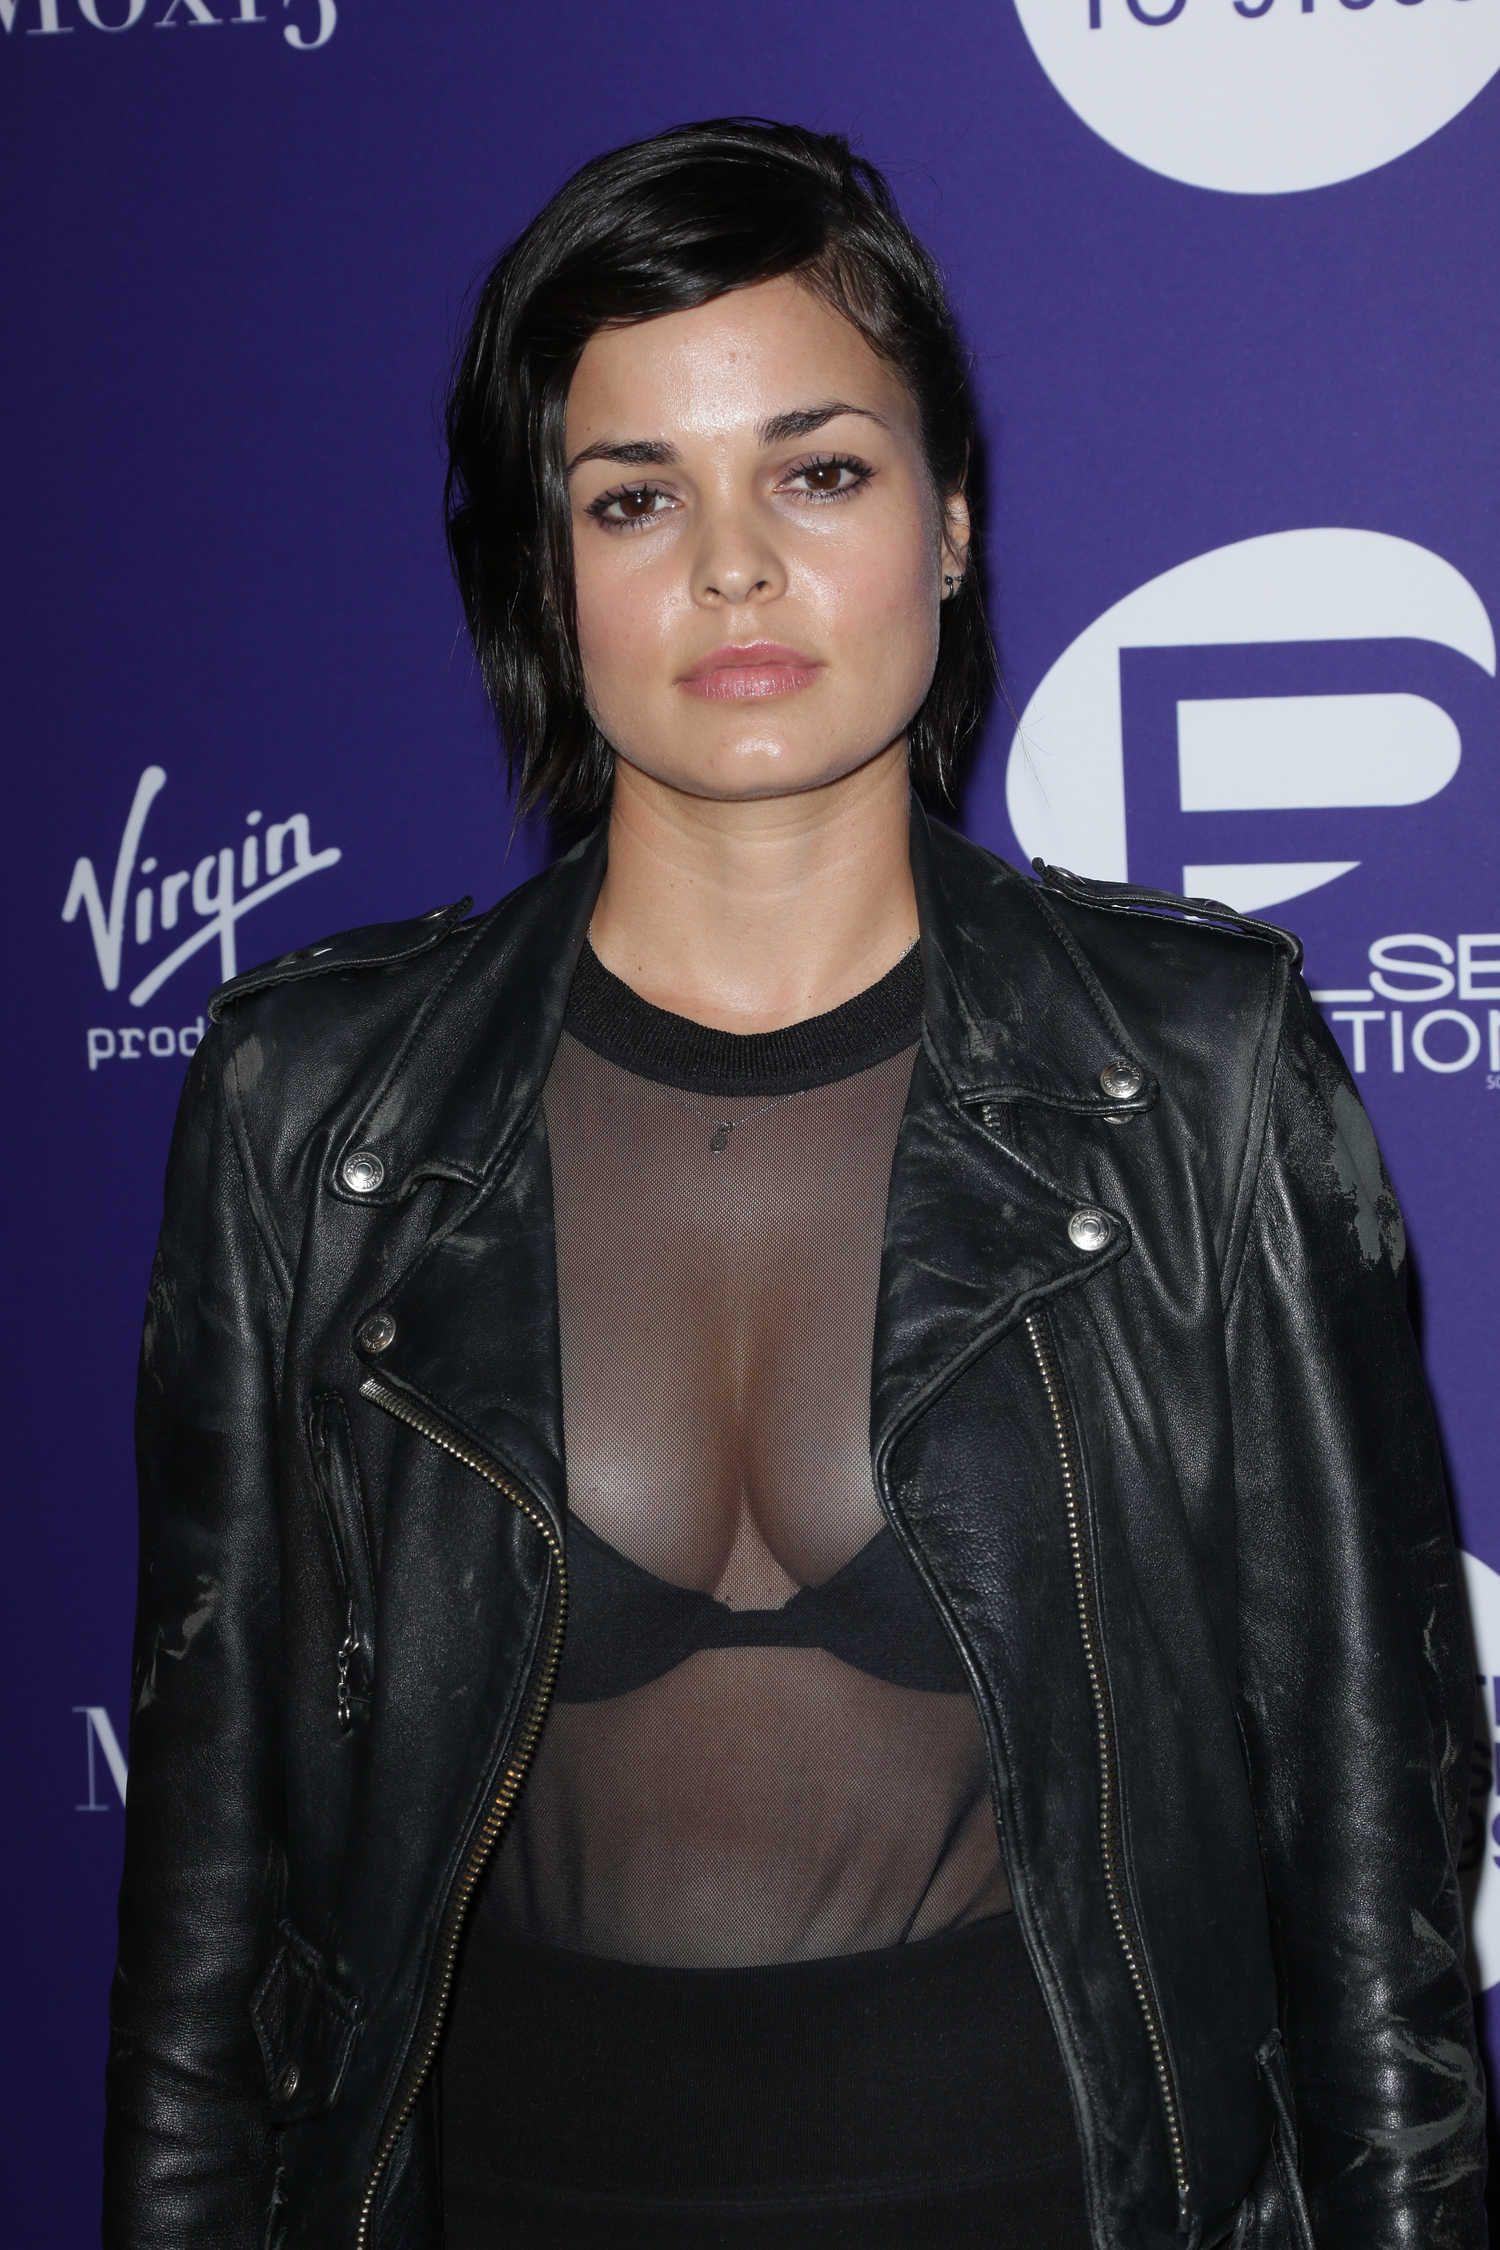 Poll celebrity lesbian fantasy,Katy perry25 XXX archive Becca Tobin nude. 2018-2019 celebrityes photos leaks!,Elsa Hosk Despondent After Sex